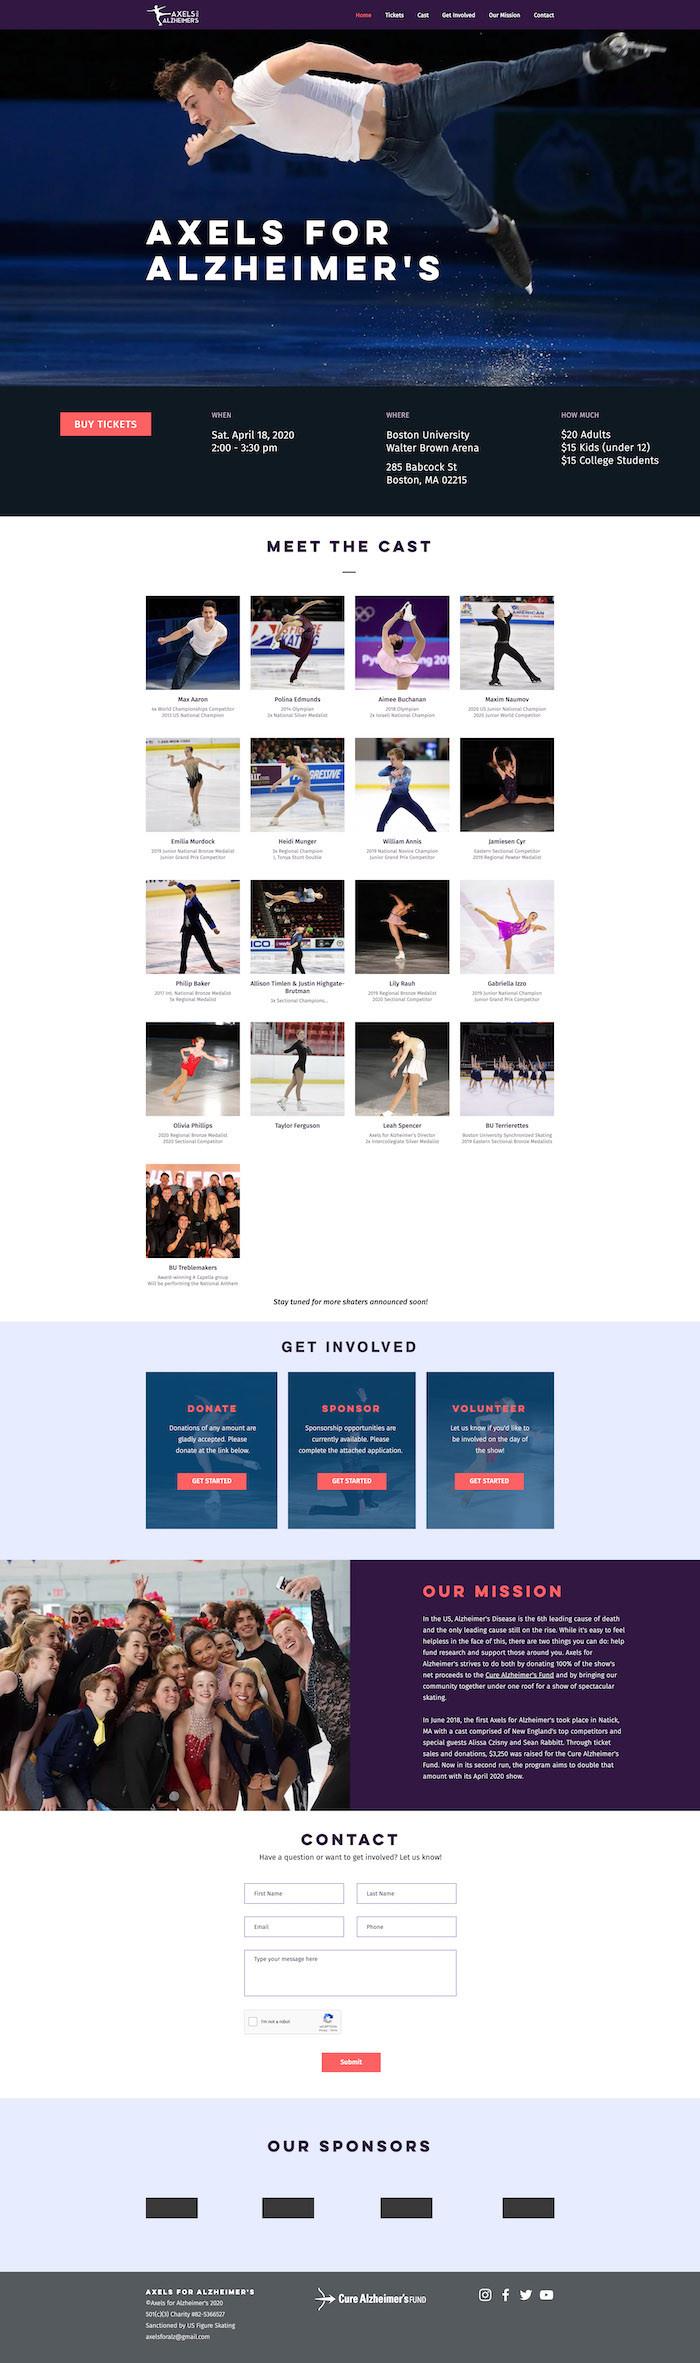 axelsforalz-website.jpg